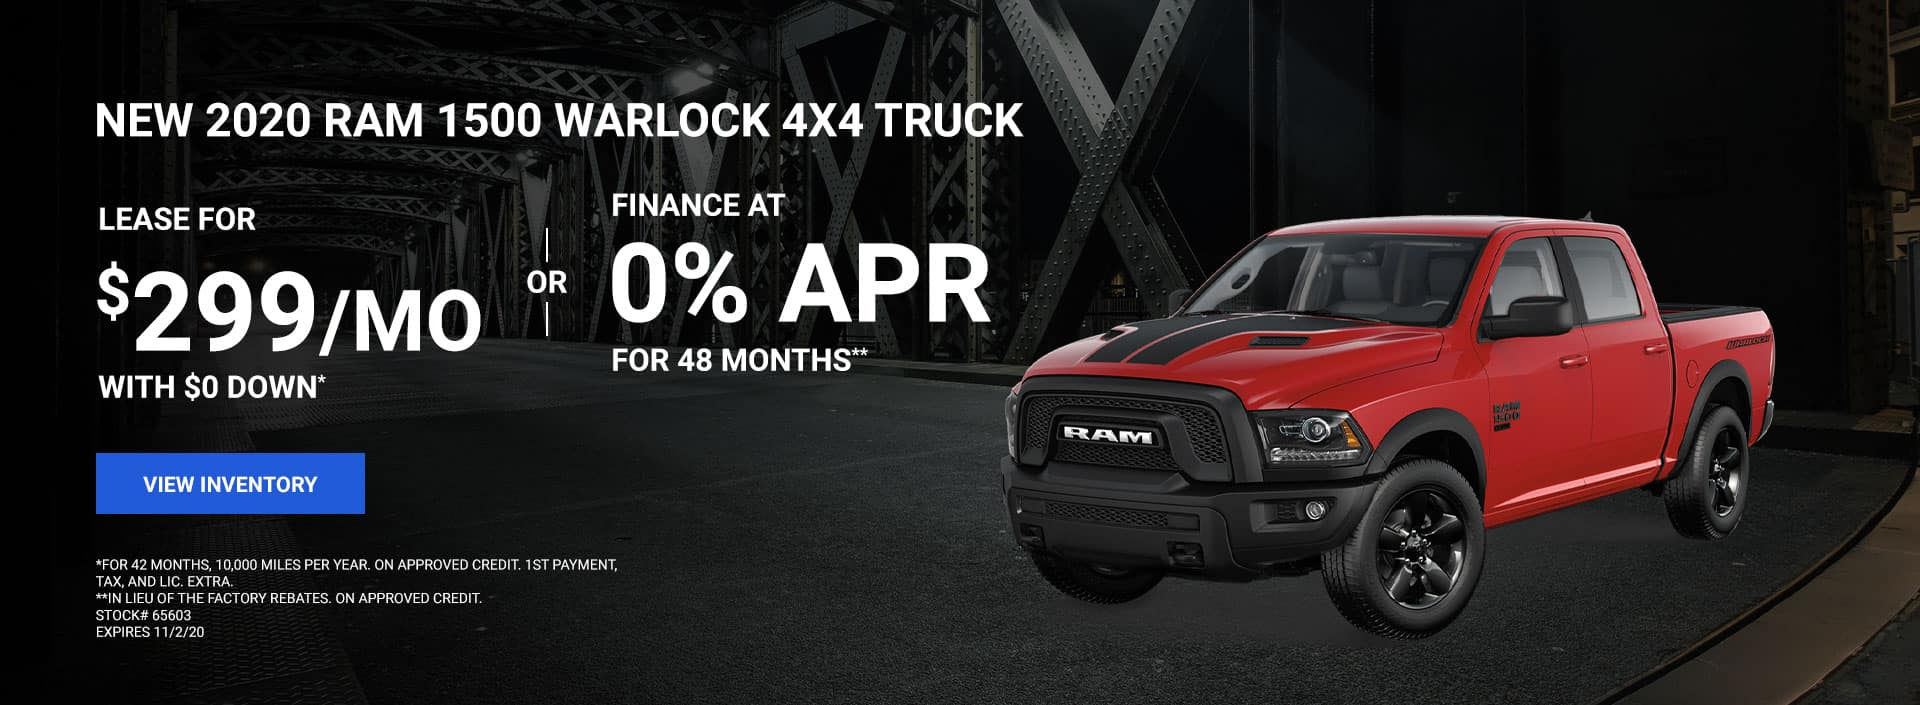 2020 RAM 1500 Warlock 4x4 Truck